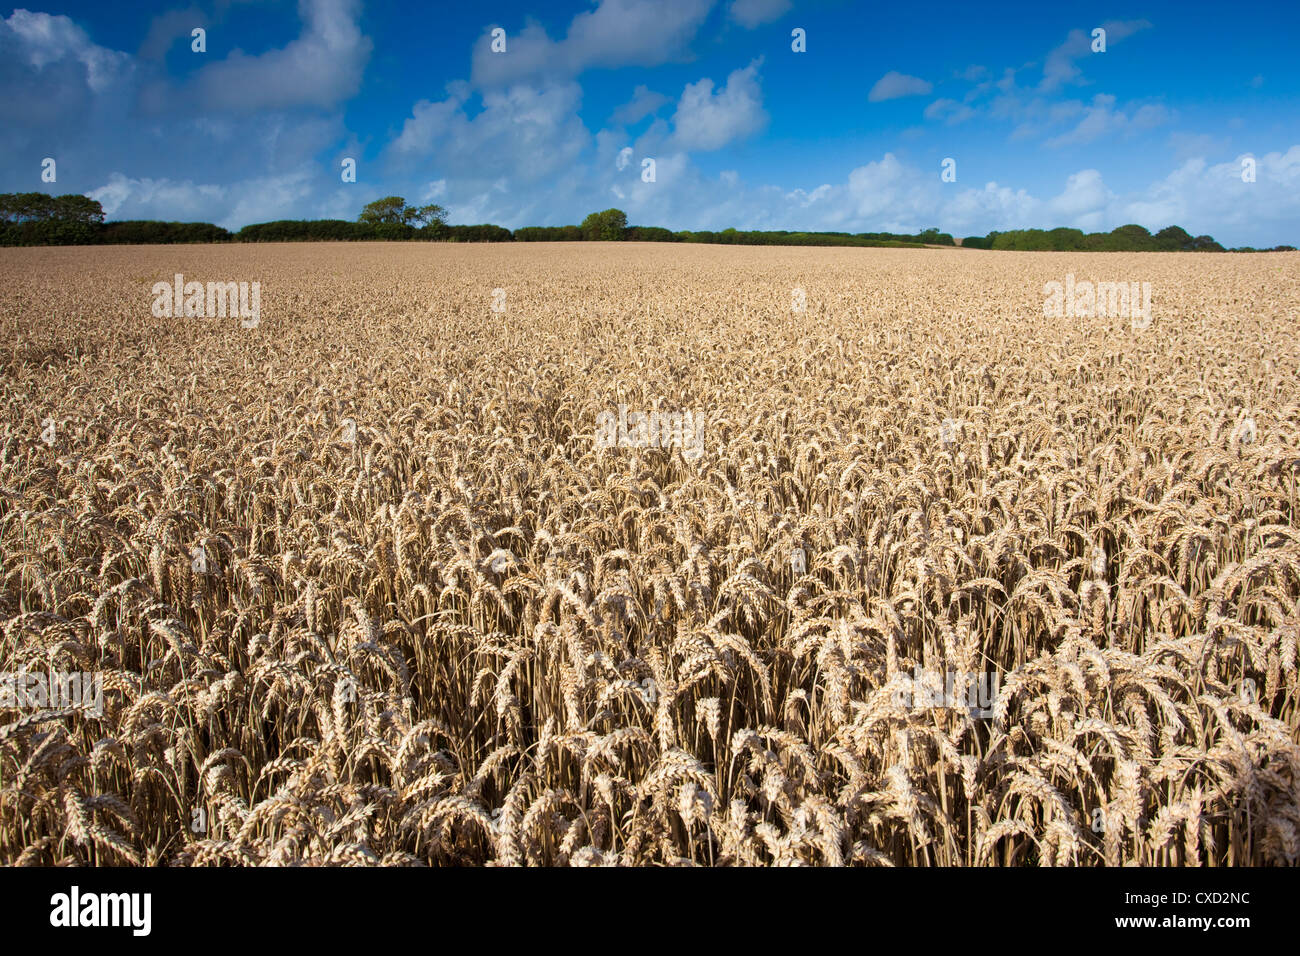 Wheat field, Devon, England, UK - Stock Image